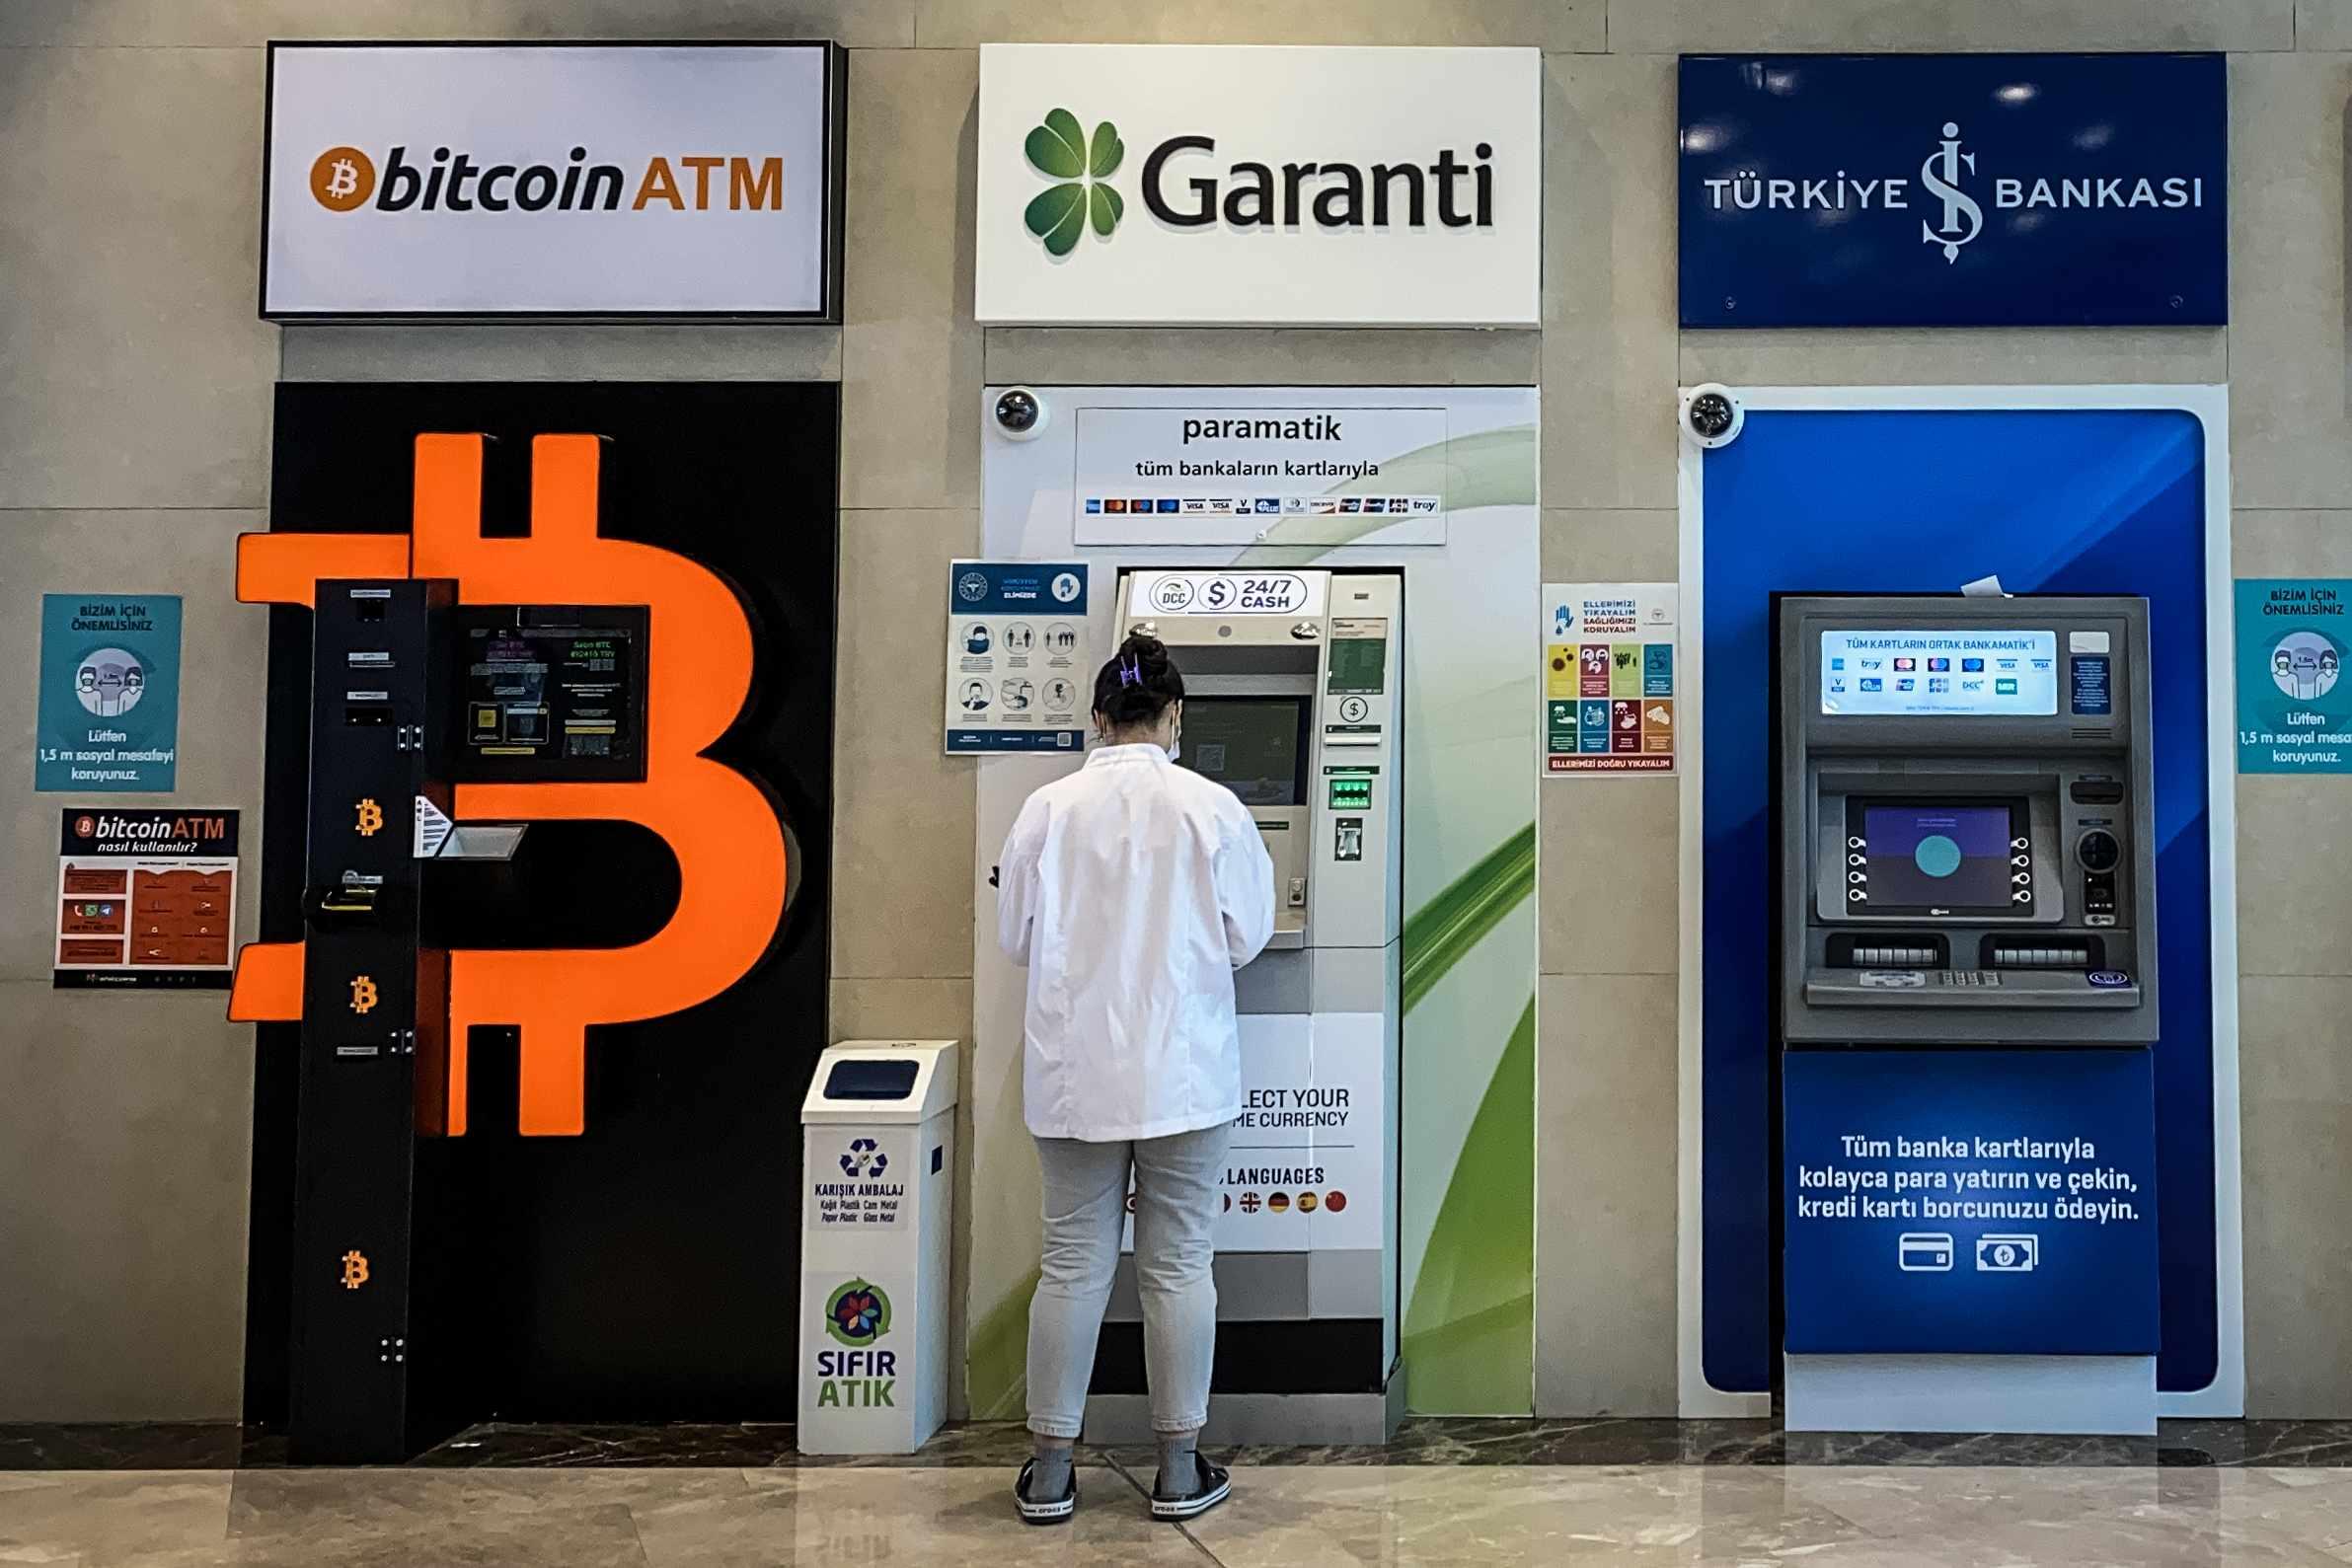 bitcoin mainstream regulation market enters